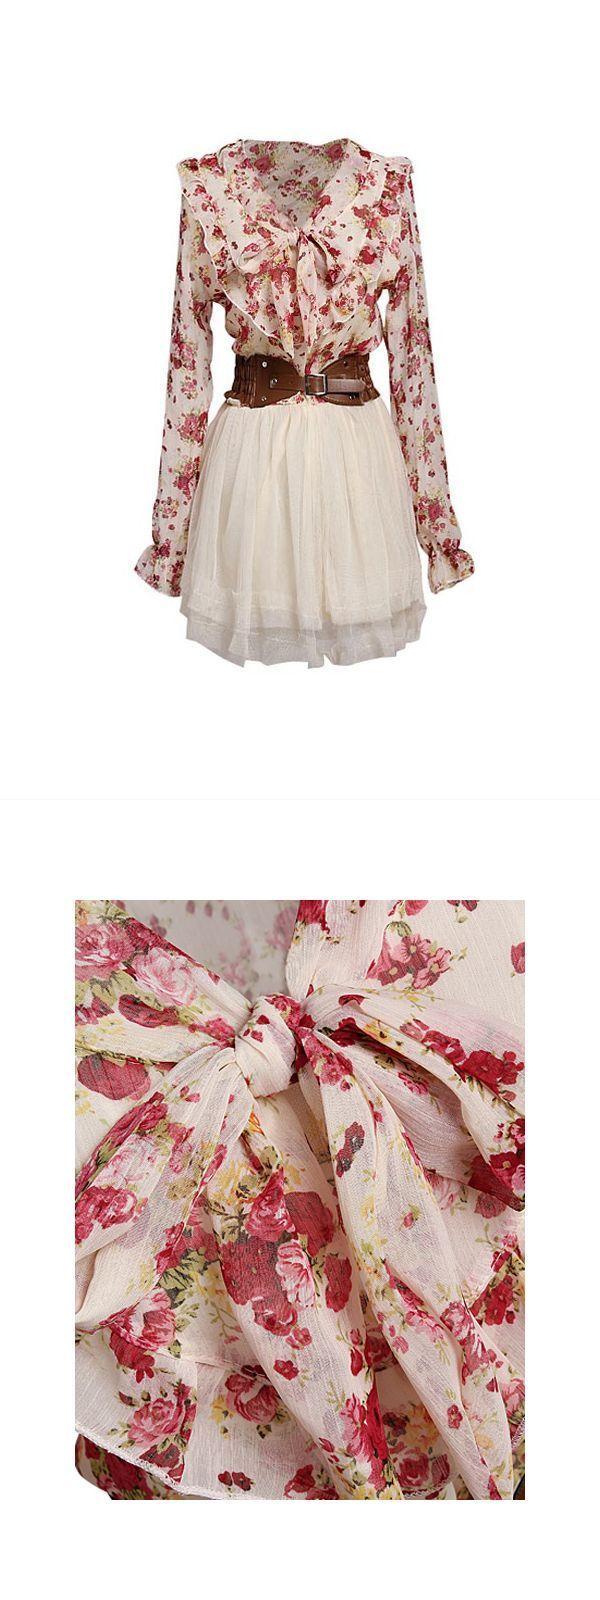 Floral dresses on sale long sleeve bowknot waist lace flower